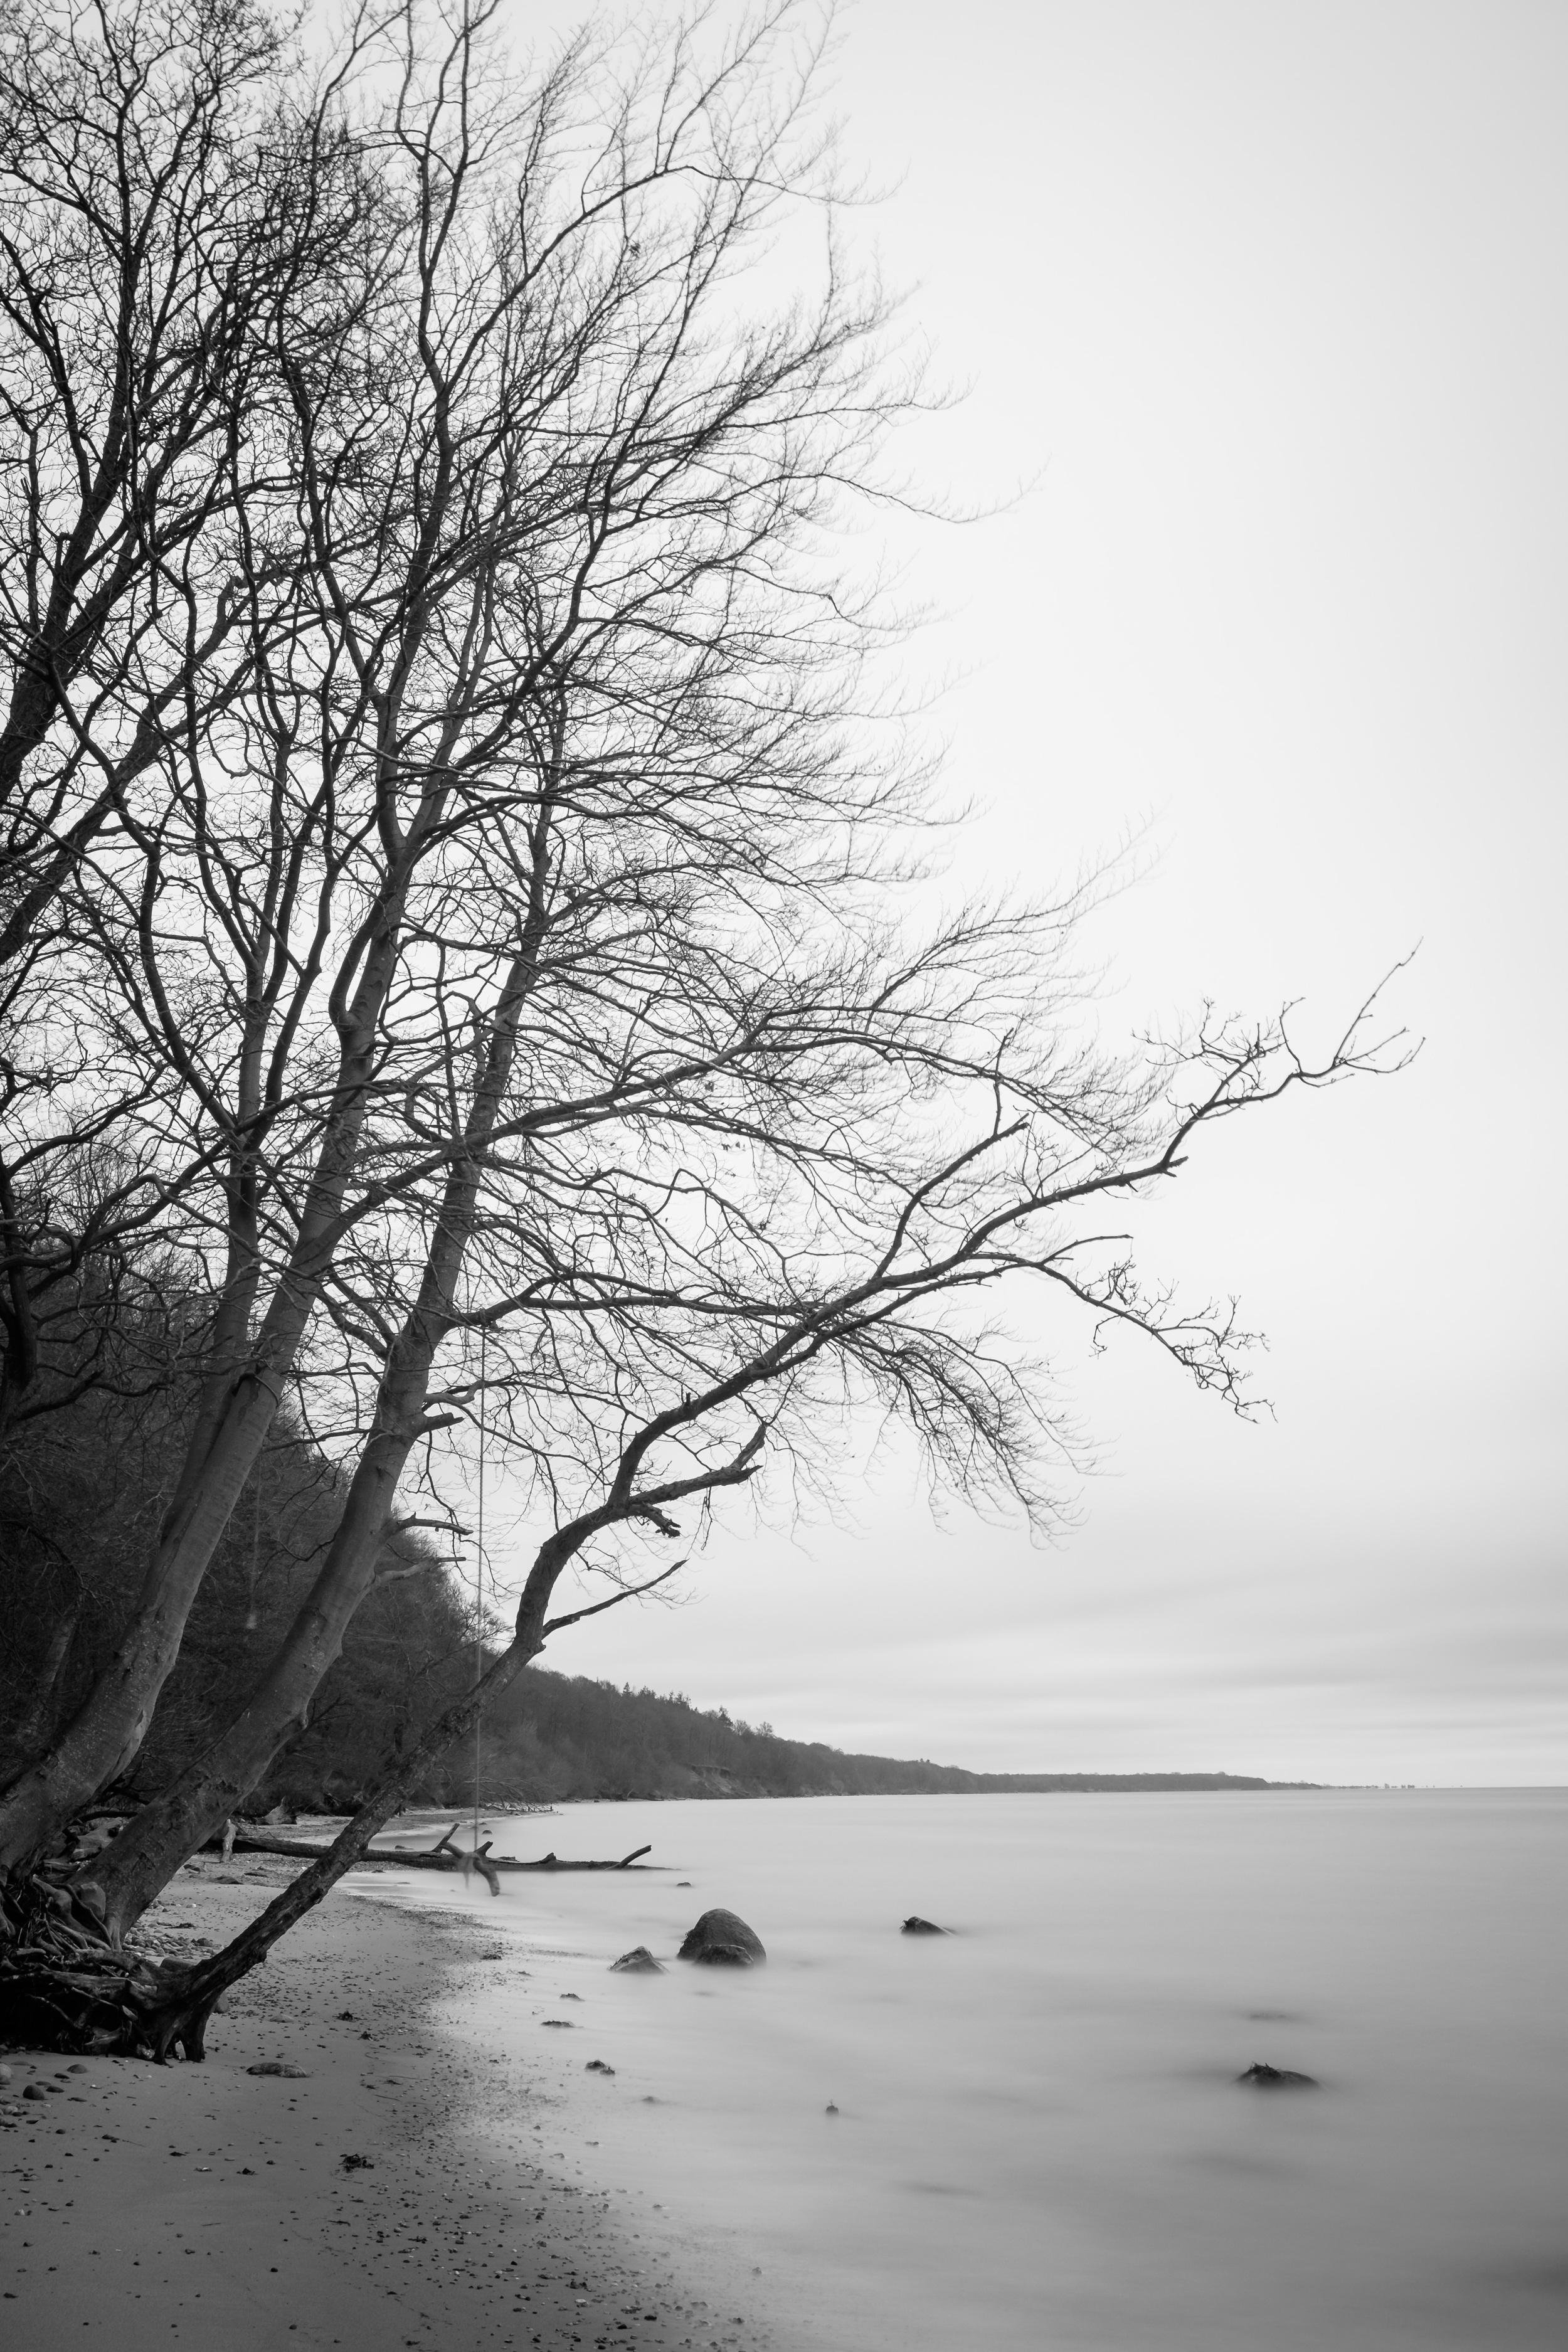 20160115-JensRohde-Staksrode strand-60.jpg